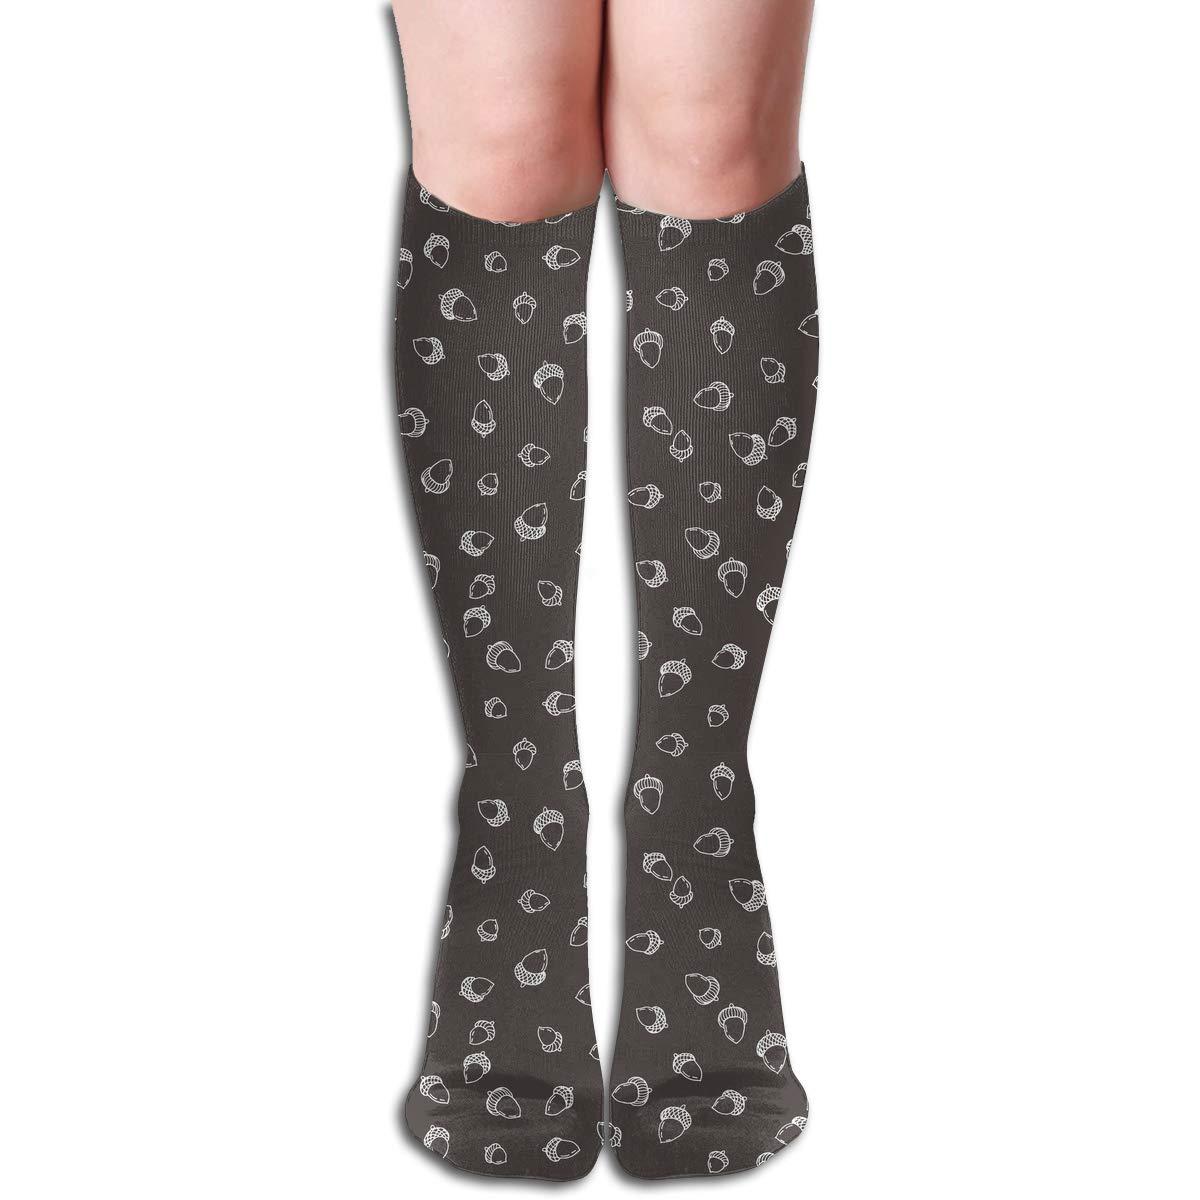 Womens Cotton High Sock Stylish Fallen Autumn Acorns Pattern Thigh High Socks For Women